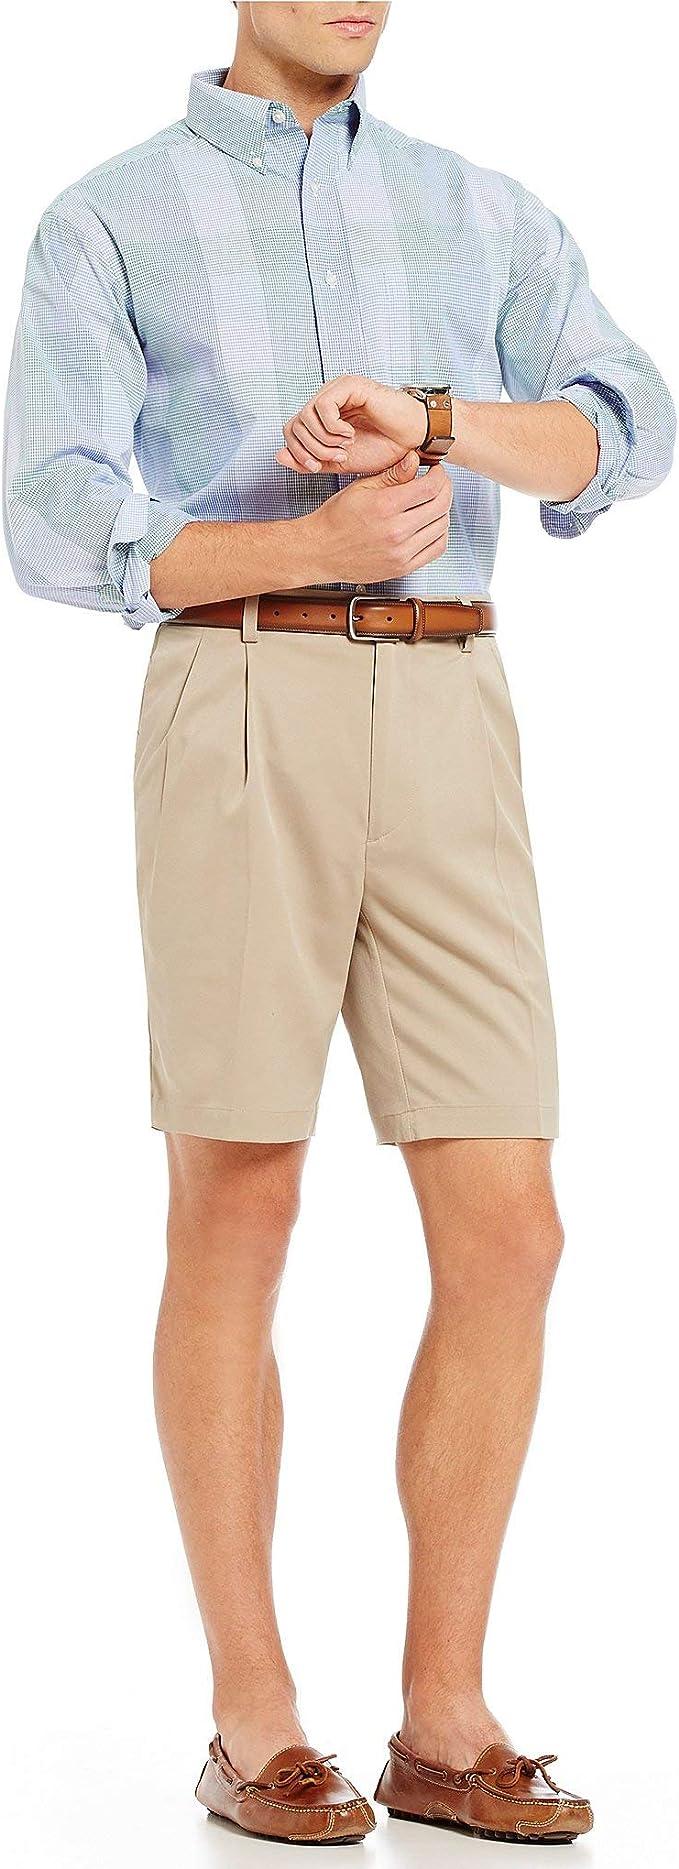 Roundtree /& Yorke Size 48 ELASTIC WAIST Khaki Cotton Pleated New Mens Shorts